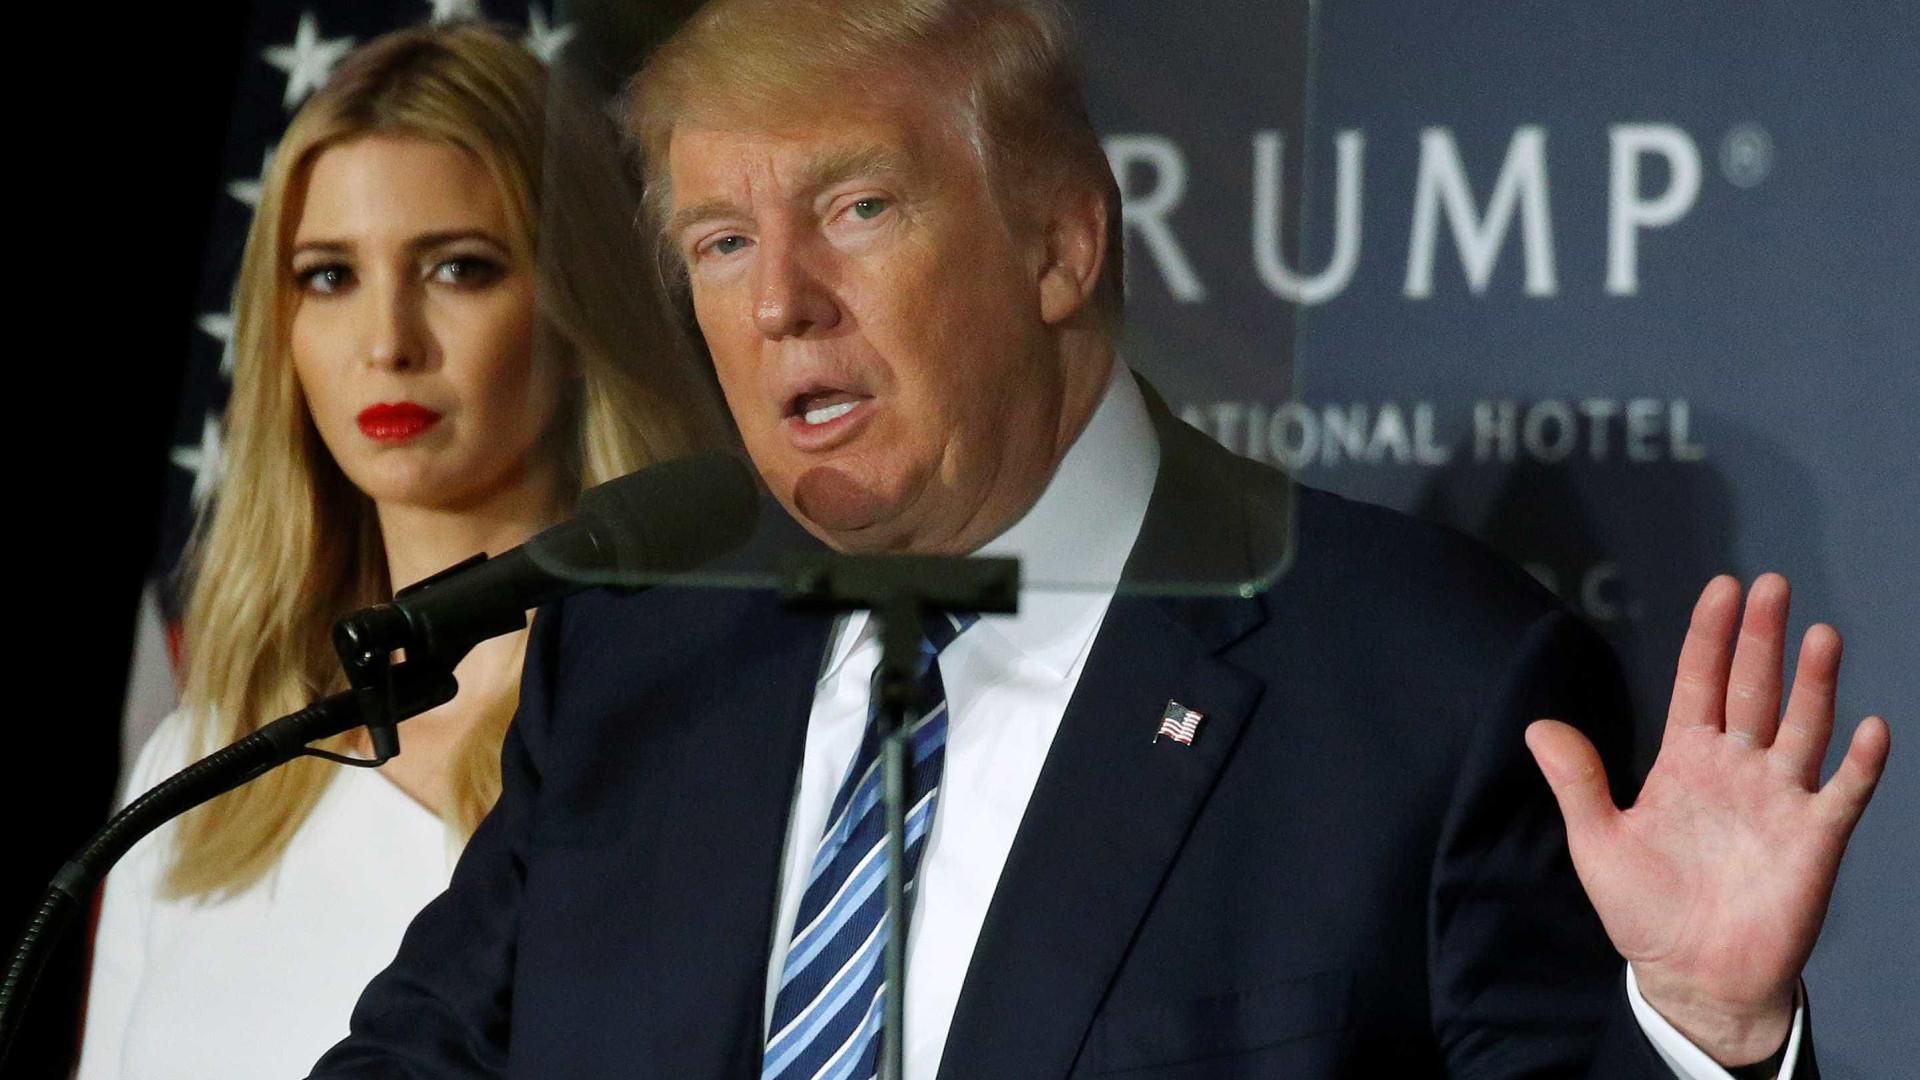 Ministro britânico pedirá desculpas a Ivanka Trump por textos vazados